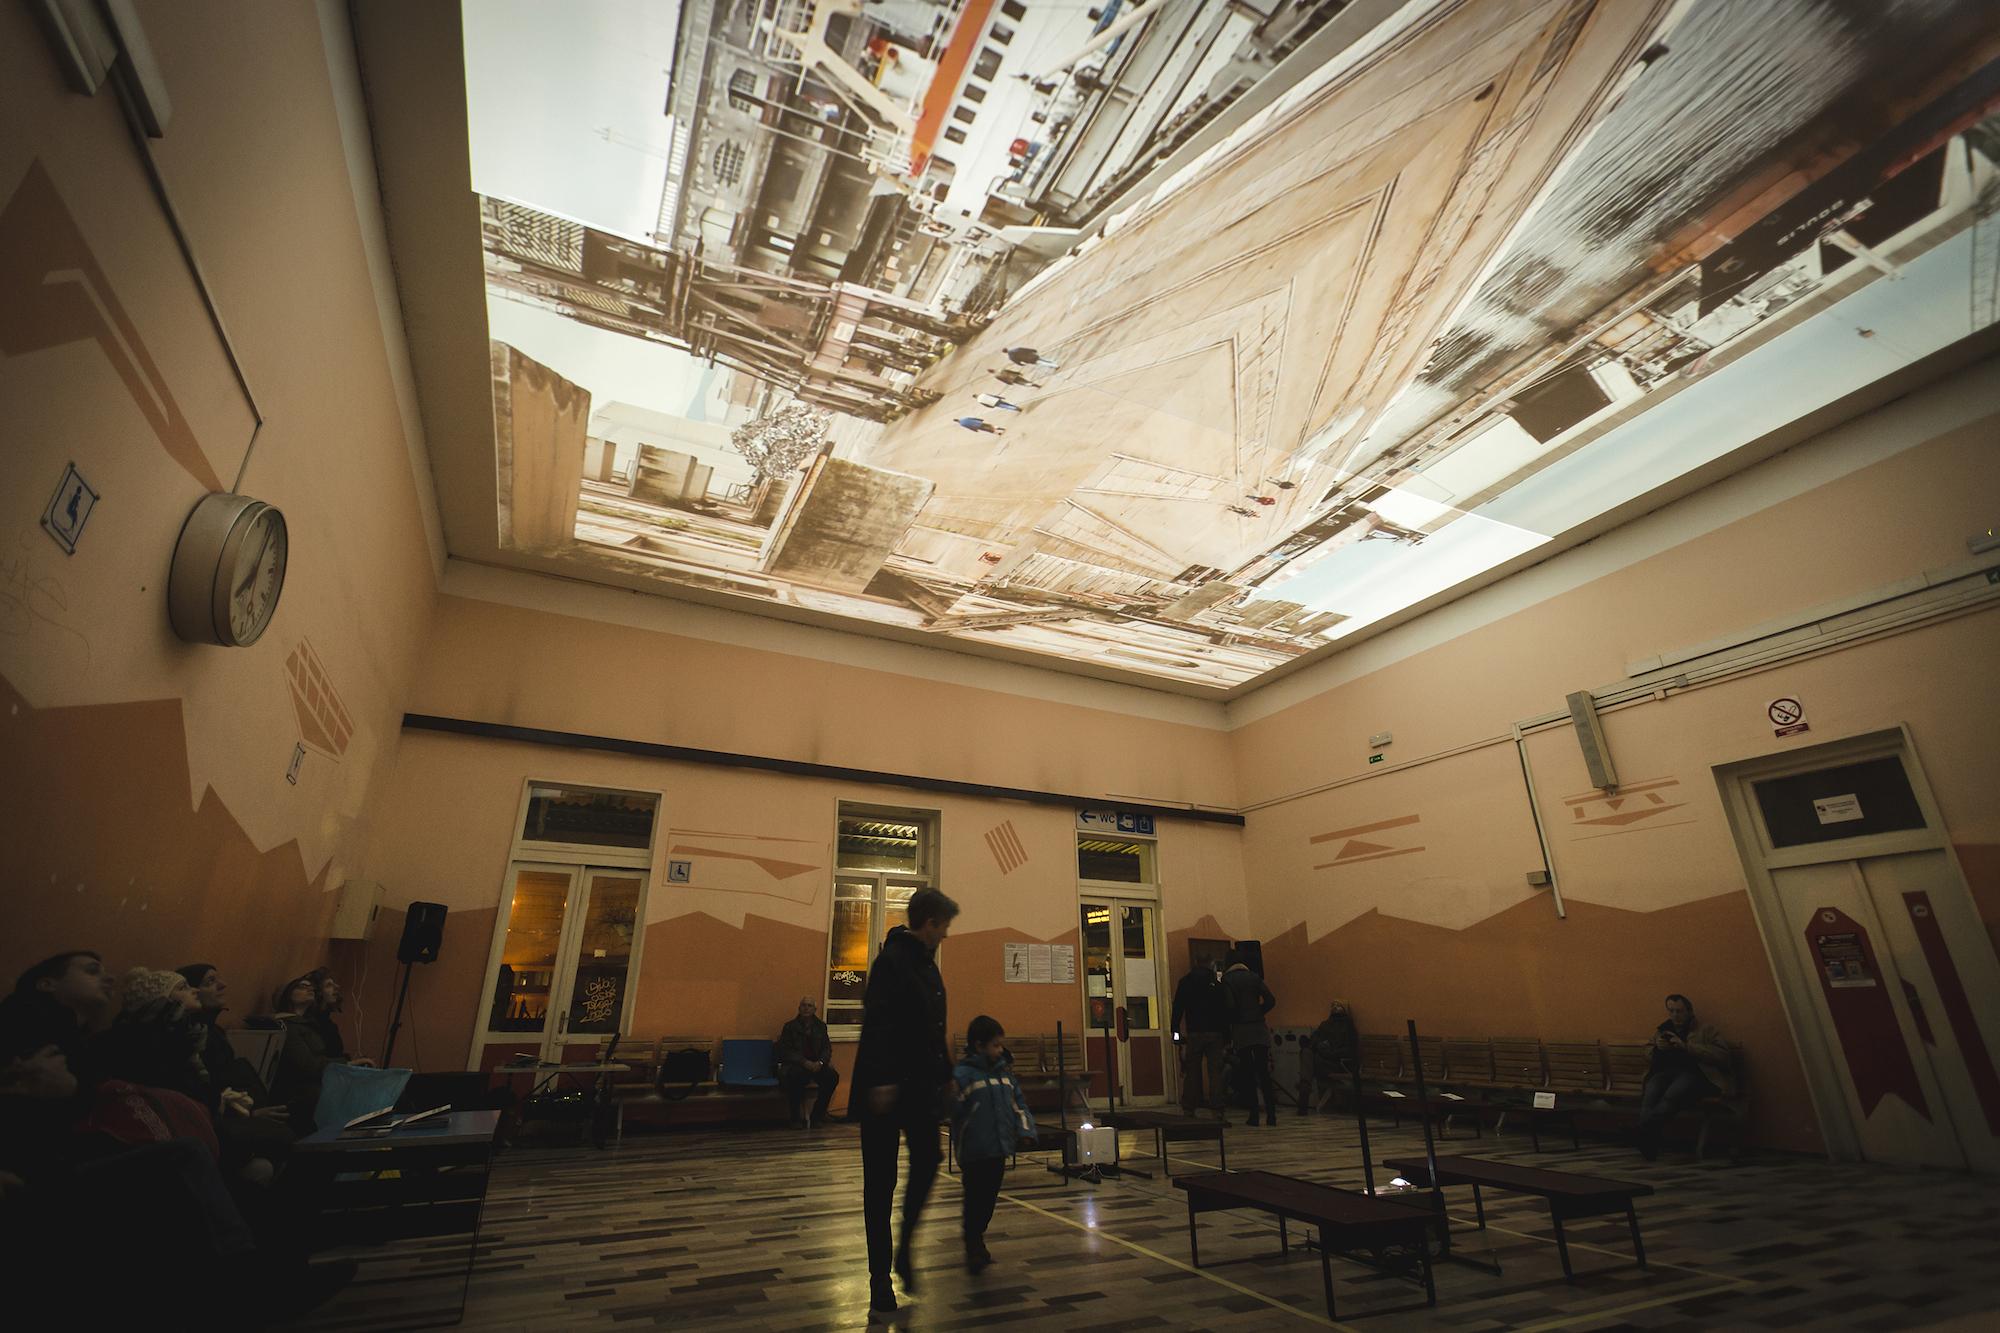 Art color rijeka - Video Documentation Of The Site Specific Installation Rijeka Train Station Waiting Room February 5th 11th 2015